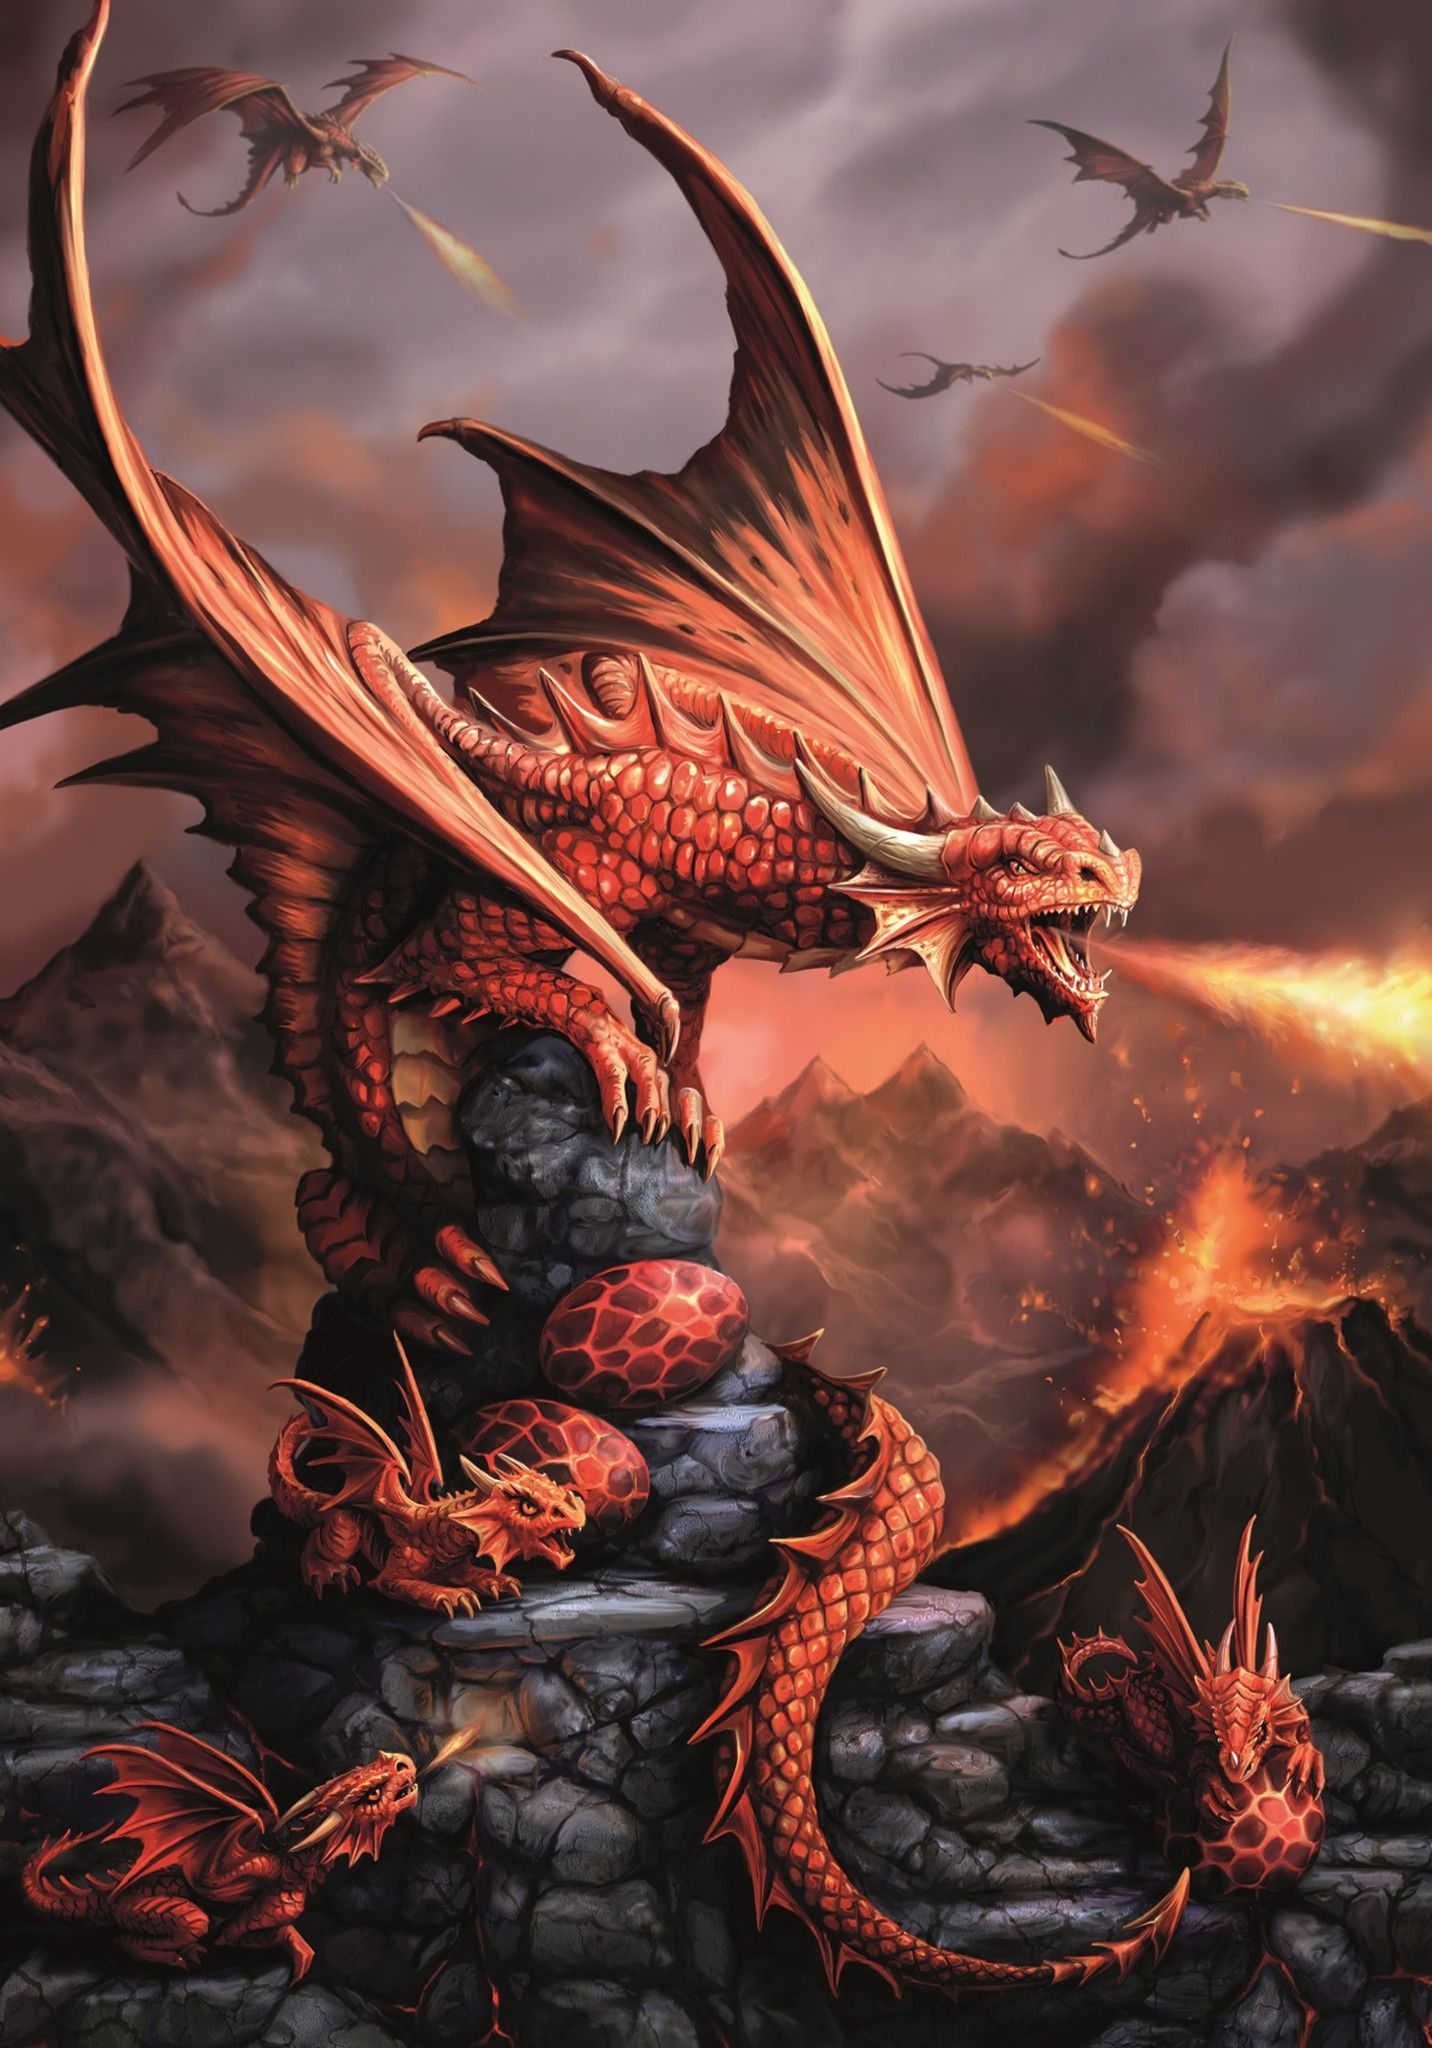 Dragon S Crown Gets New Character Art Screens Tarot: Dragon, Dragon Artwork